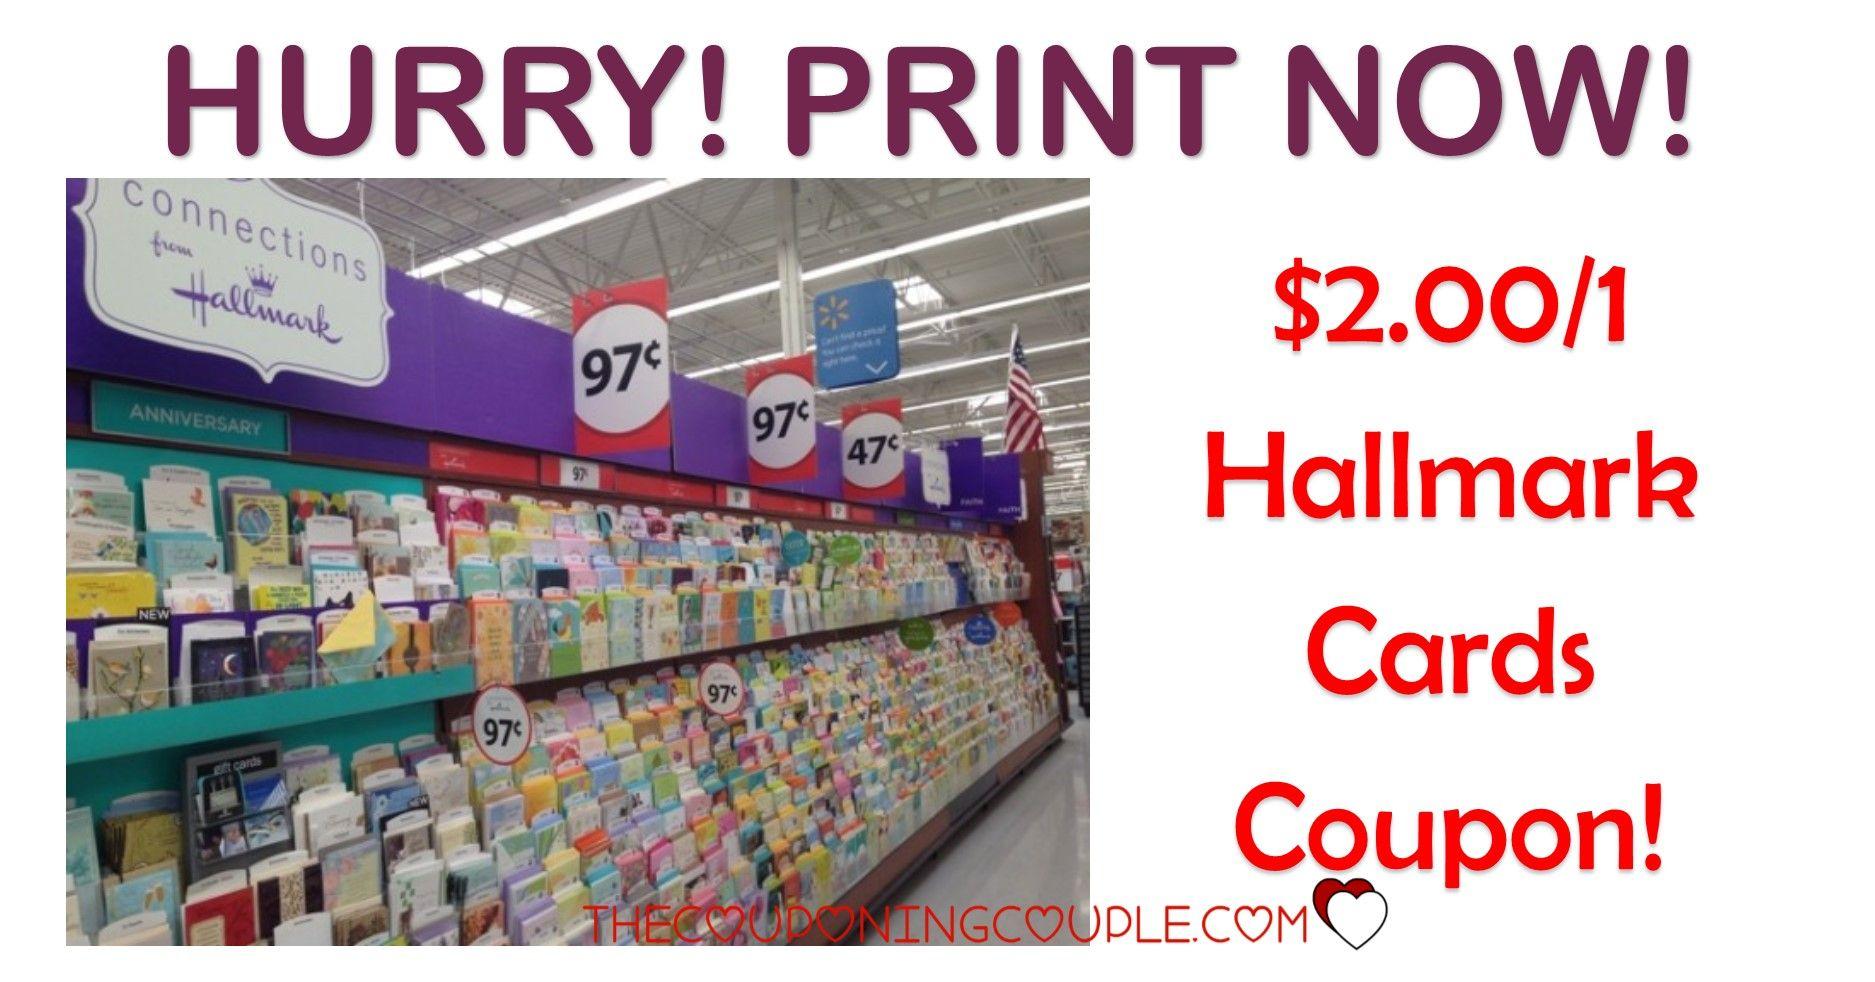 1 00 2 hallmark cards coupon print now